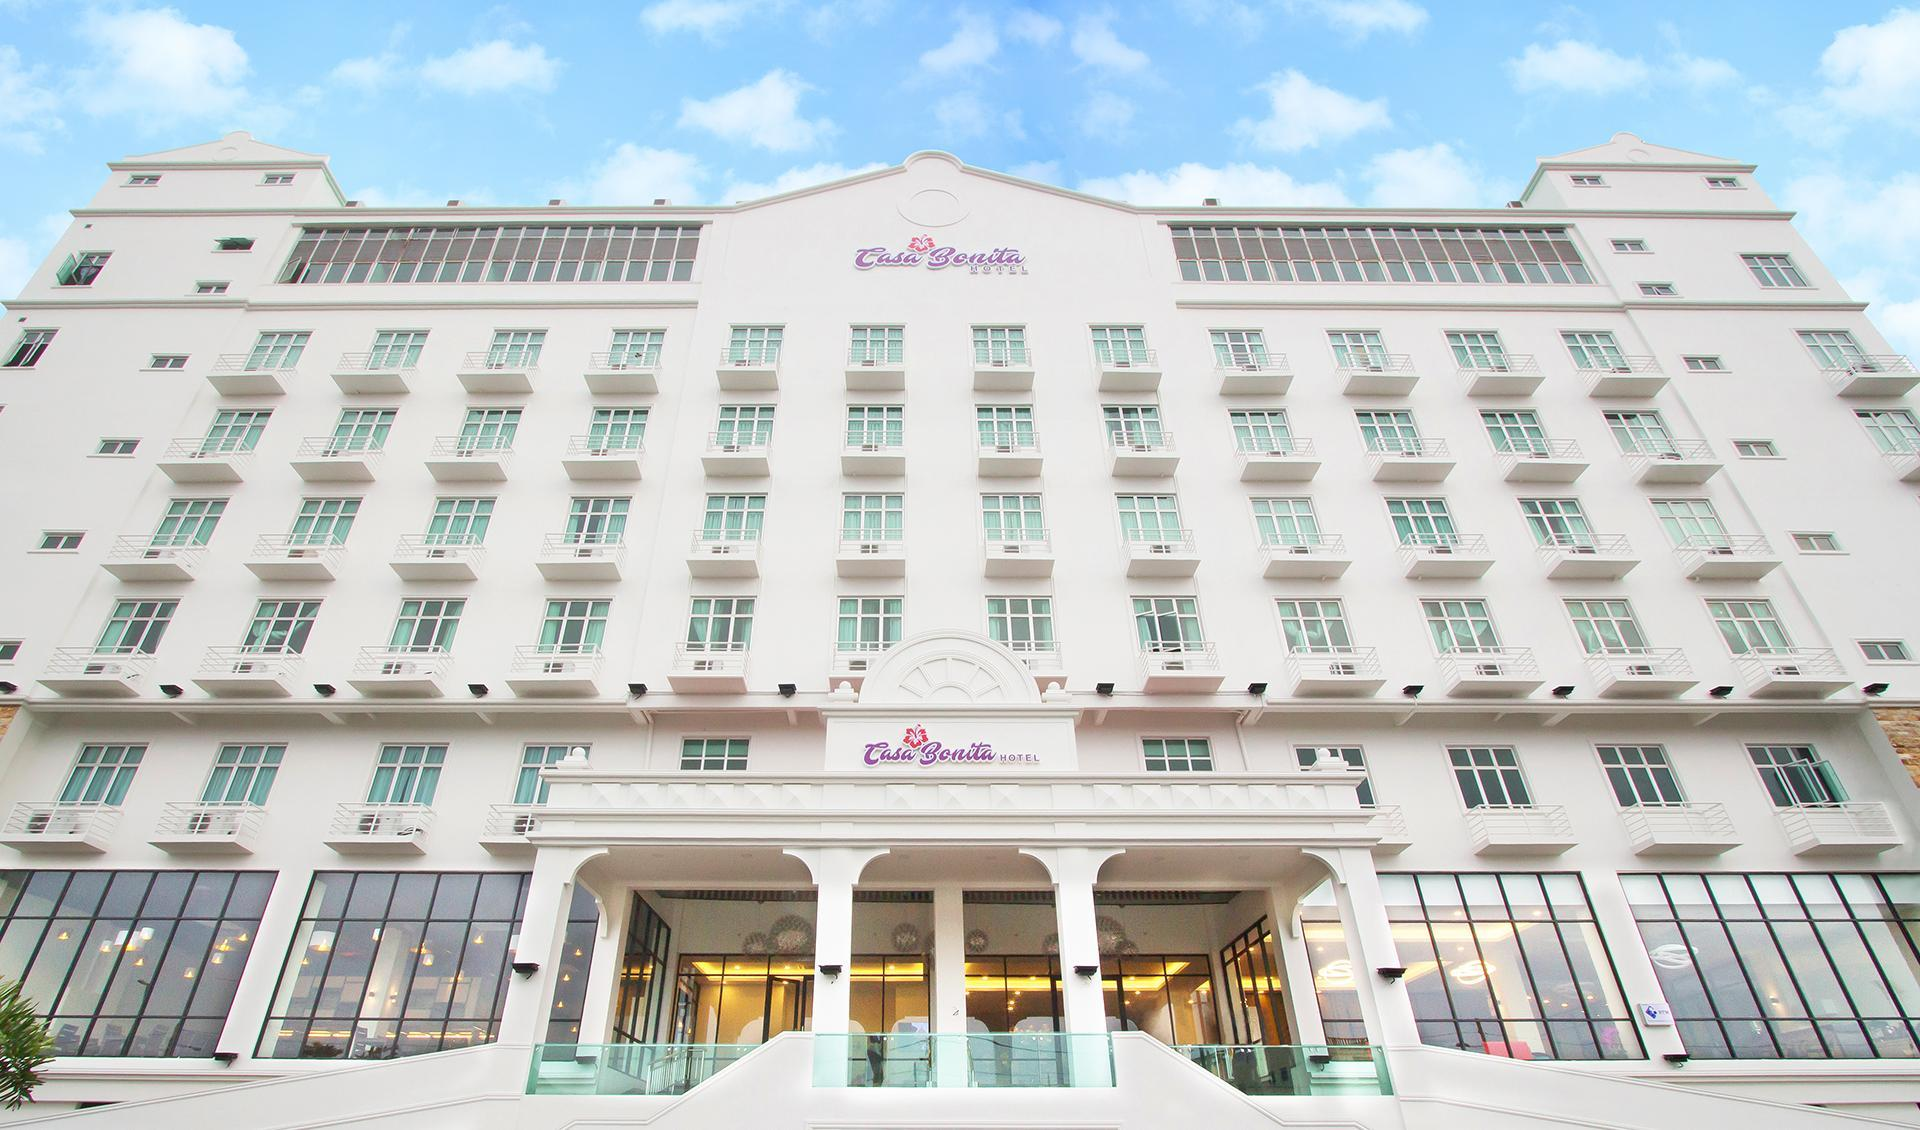 Casa Bonita Hotel